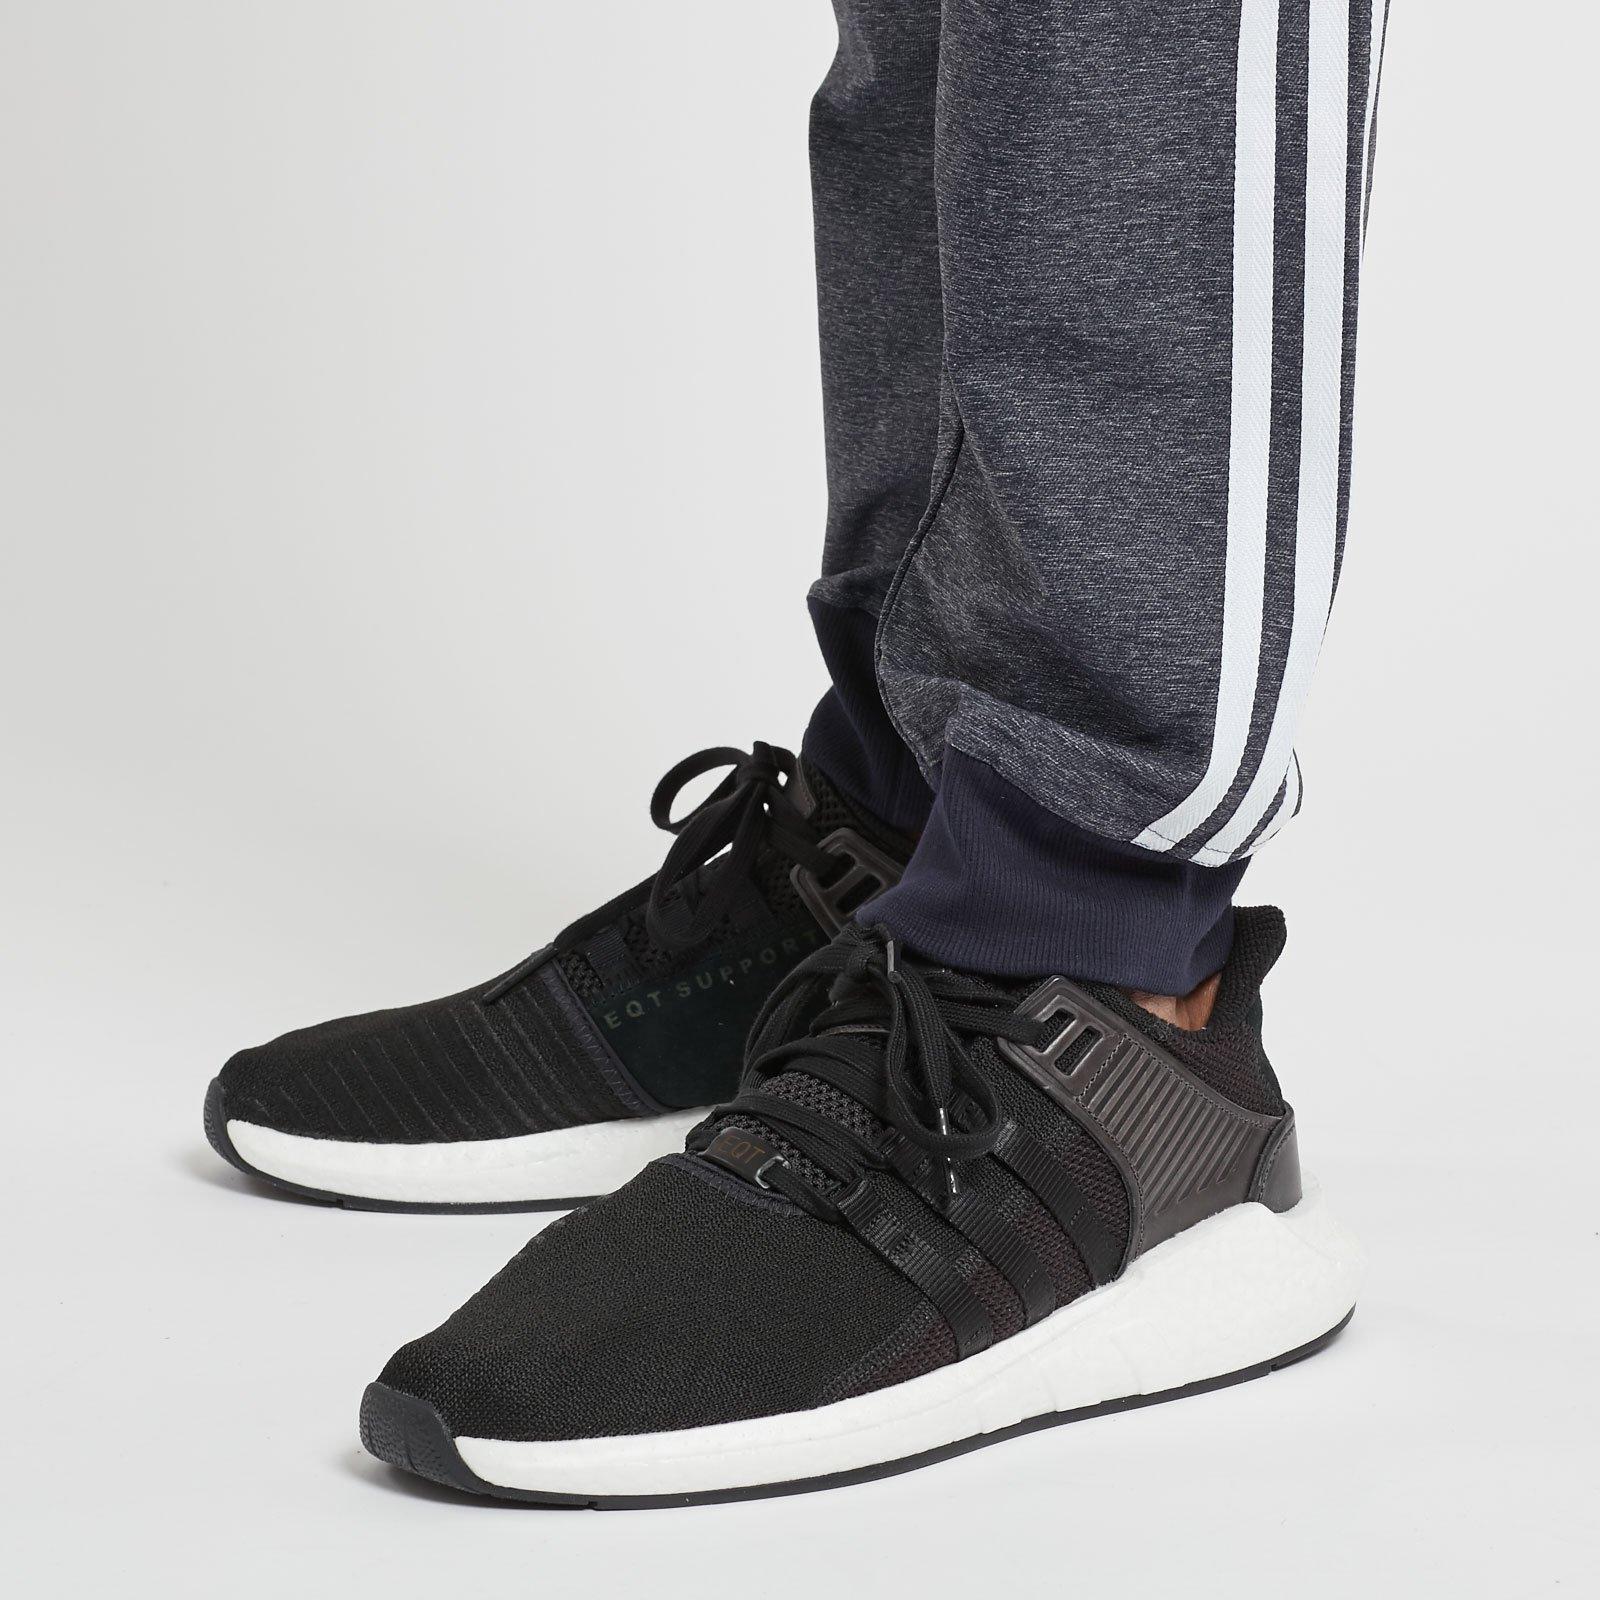 26d60636b588e adidas Tko Clr84 Woven Pant - Bk2225 - Sneakersnstuff | sneakers ...